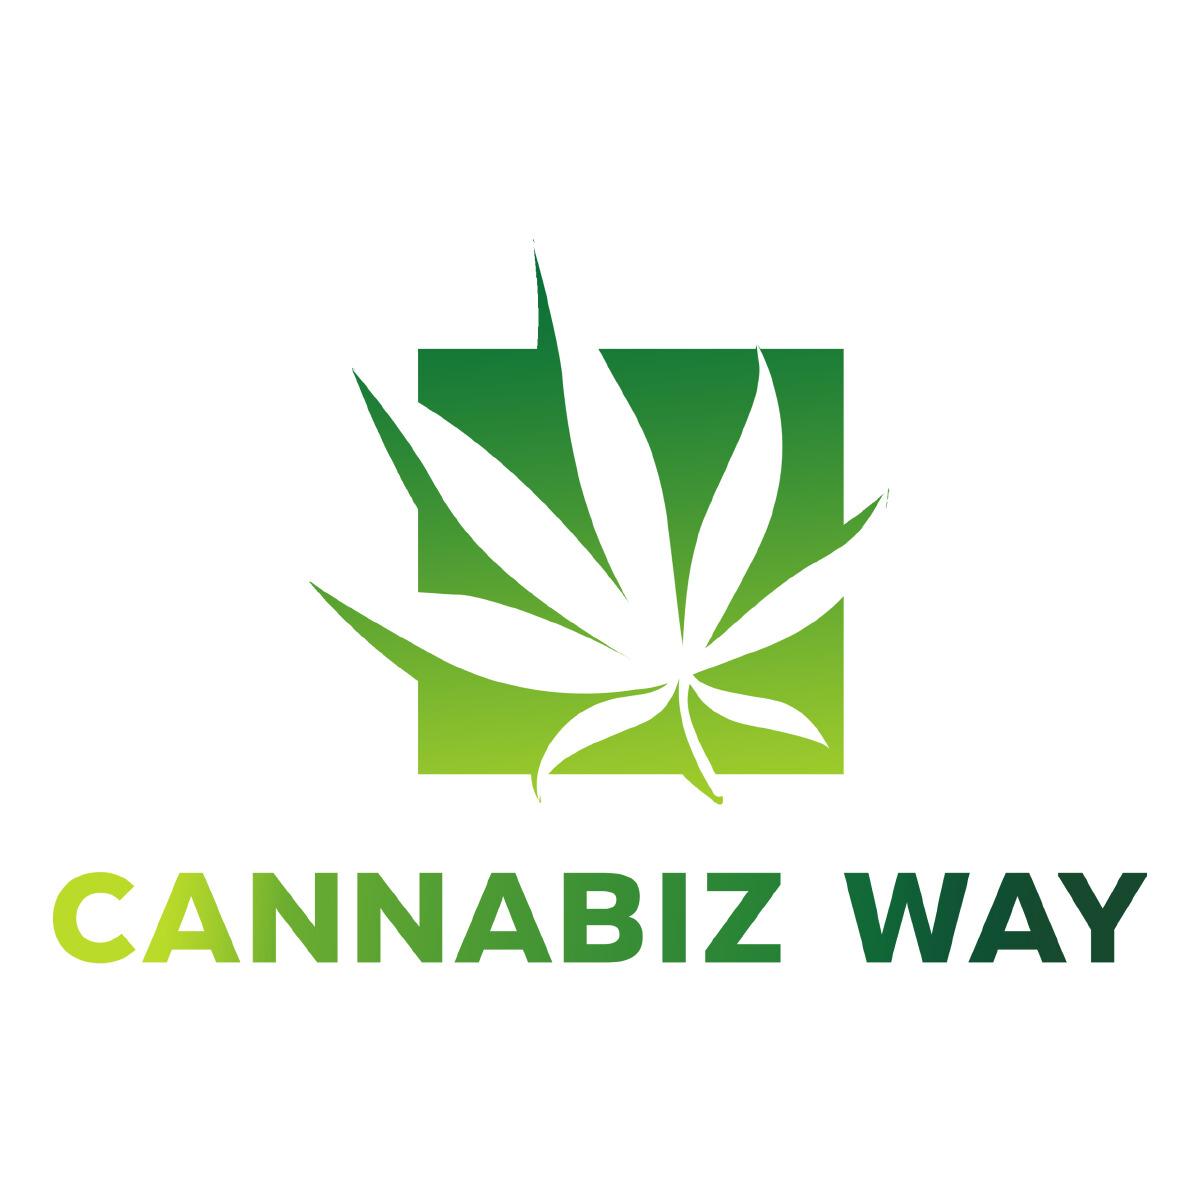 Cannabiz Way Co.,Ltd ผู้ปลูกและพัฒนาพืชกัญชา-กัญชง